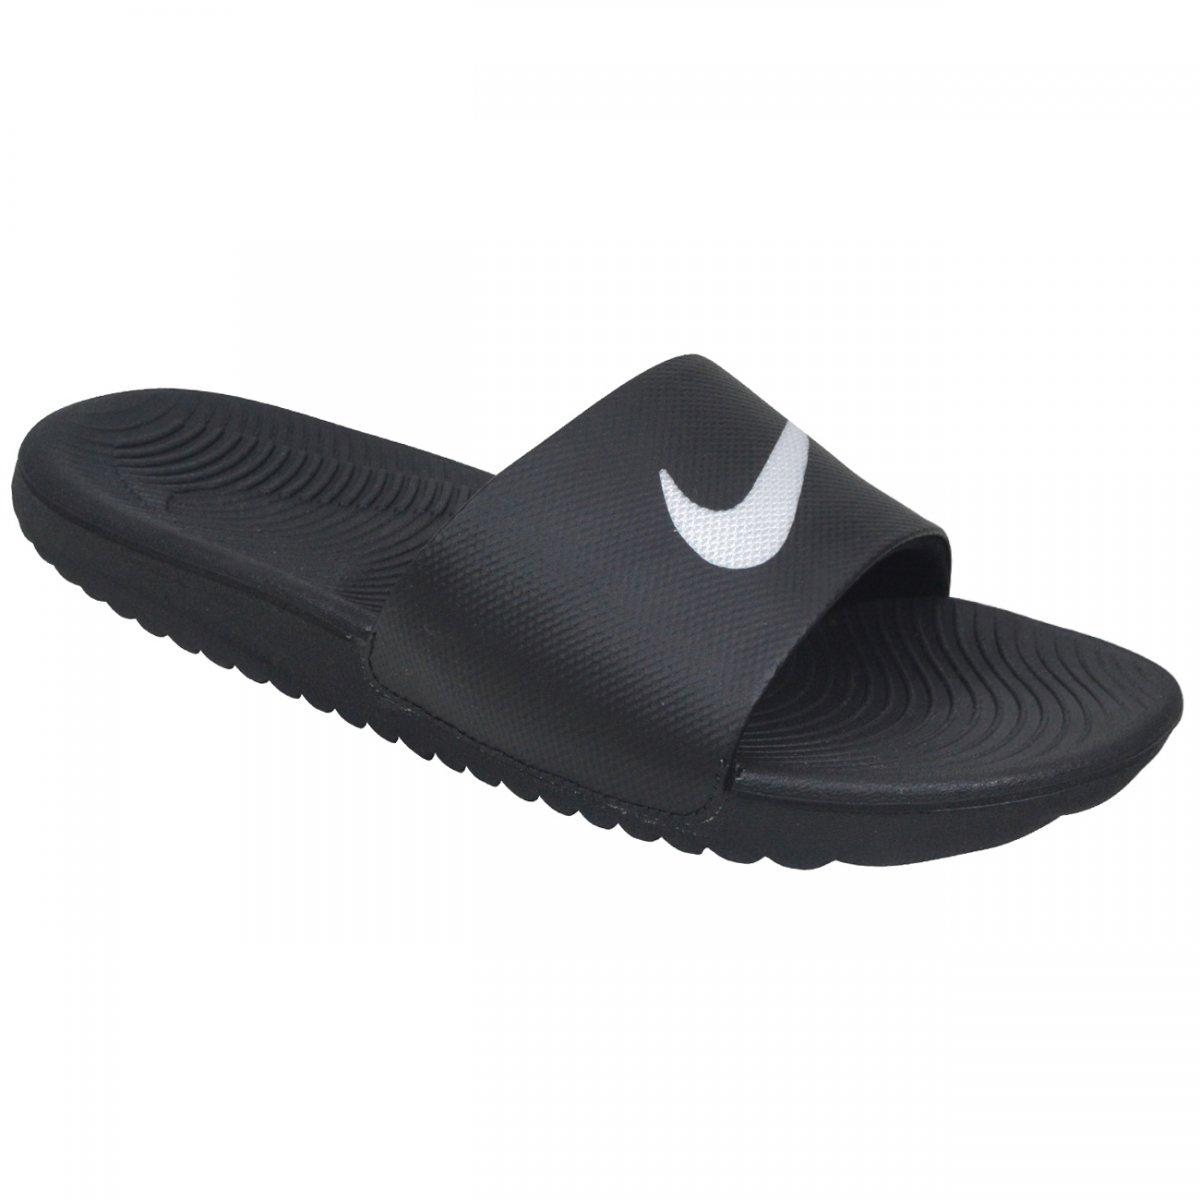 741d6a0333 Chinelo Nike Kawa Slide 83264 010 - Preto branco - Chuteira Nike ...